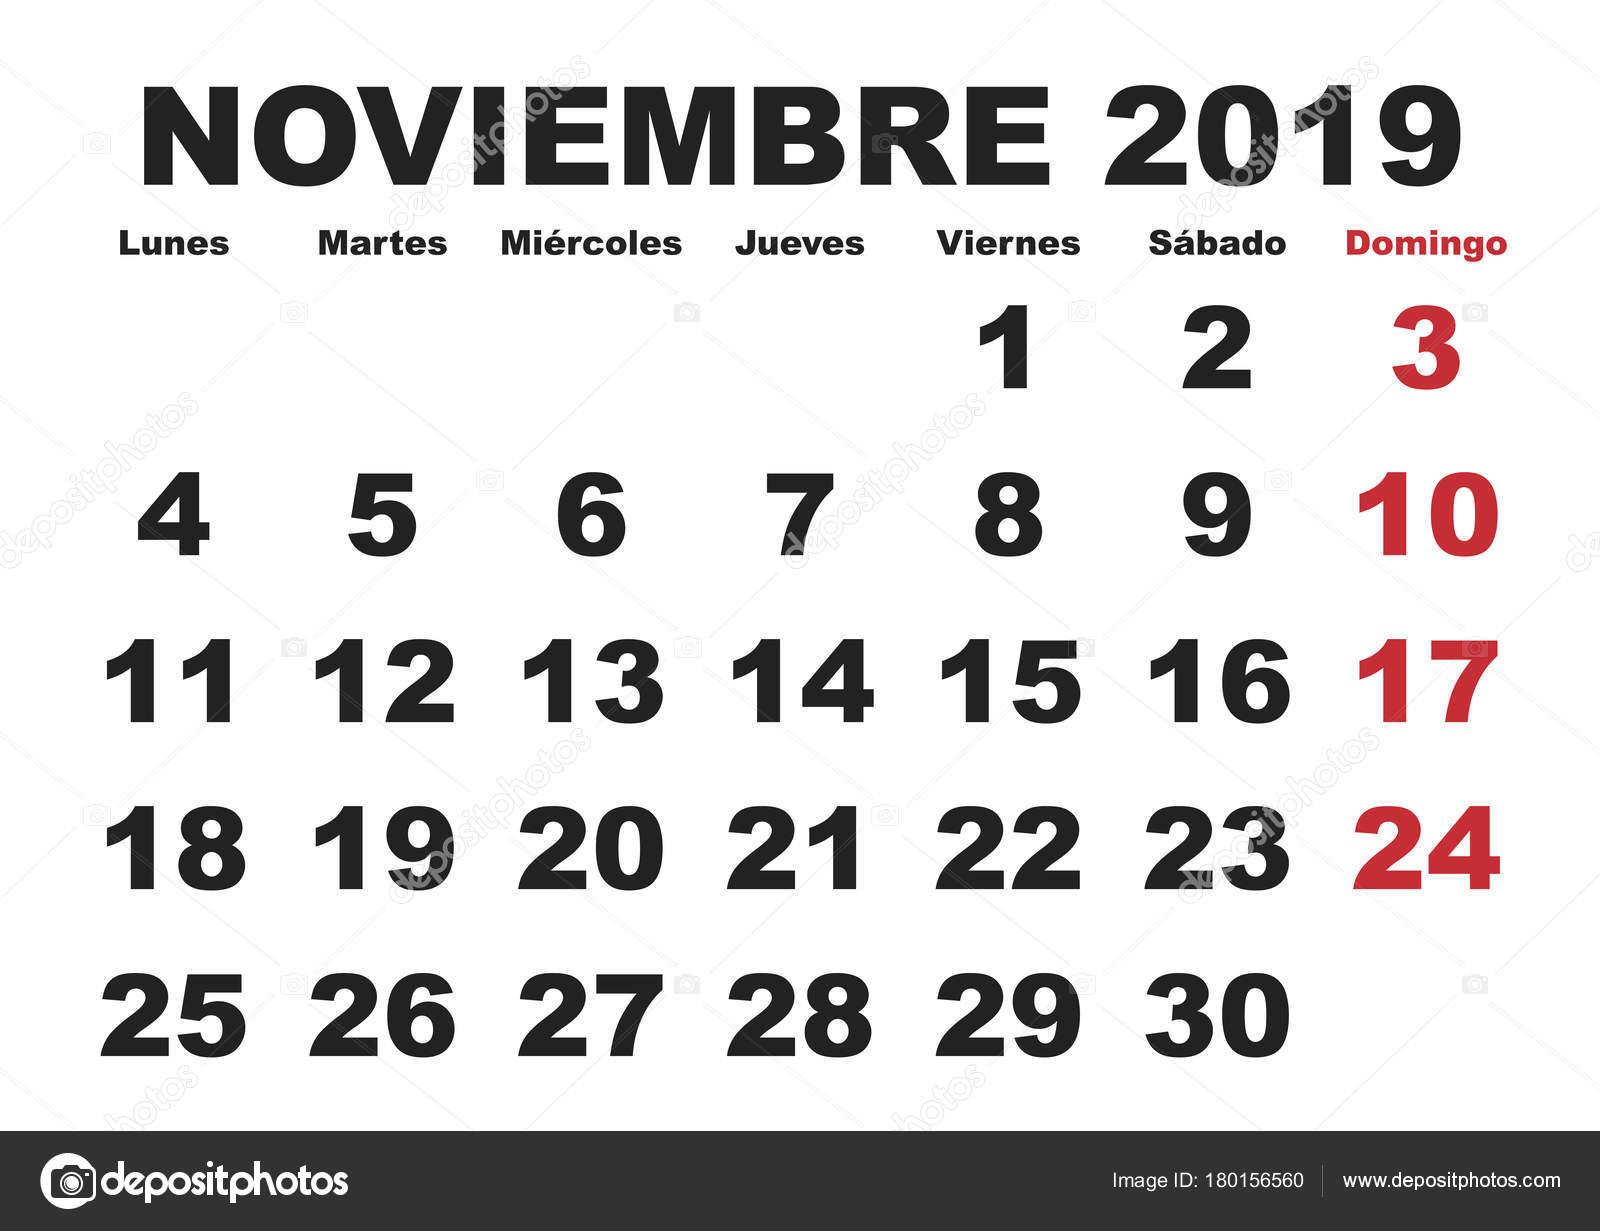 14 Kasım 2019 Perşembe